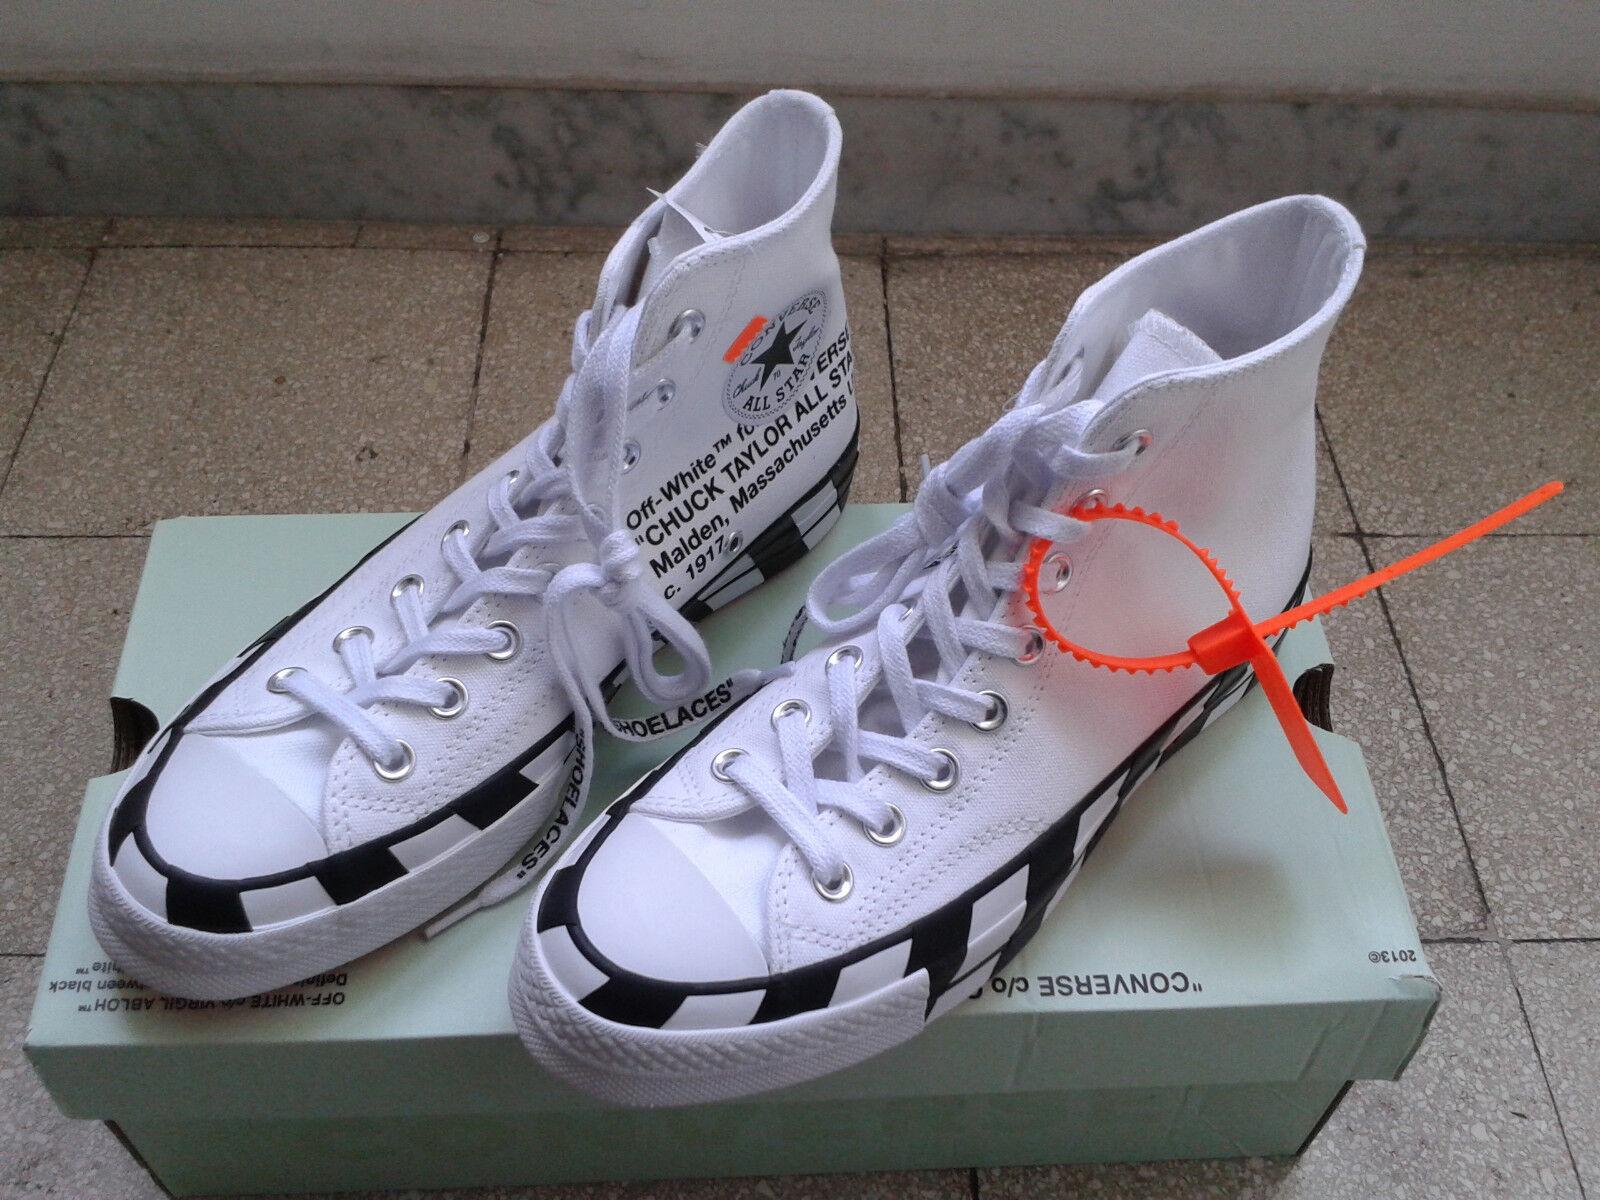 Converse x Off-bianca Chuck 70 High Top    ULTIMO DISPONIBILE    US 6.5   EU 39.5 | Buy Speciale  | Uomo/Donne Scarpa